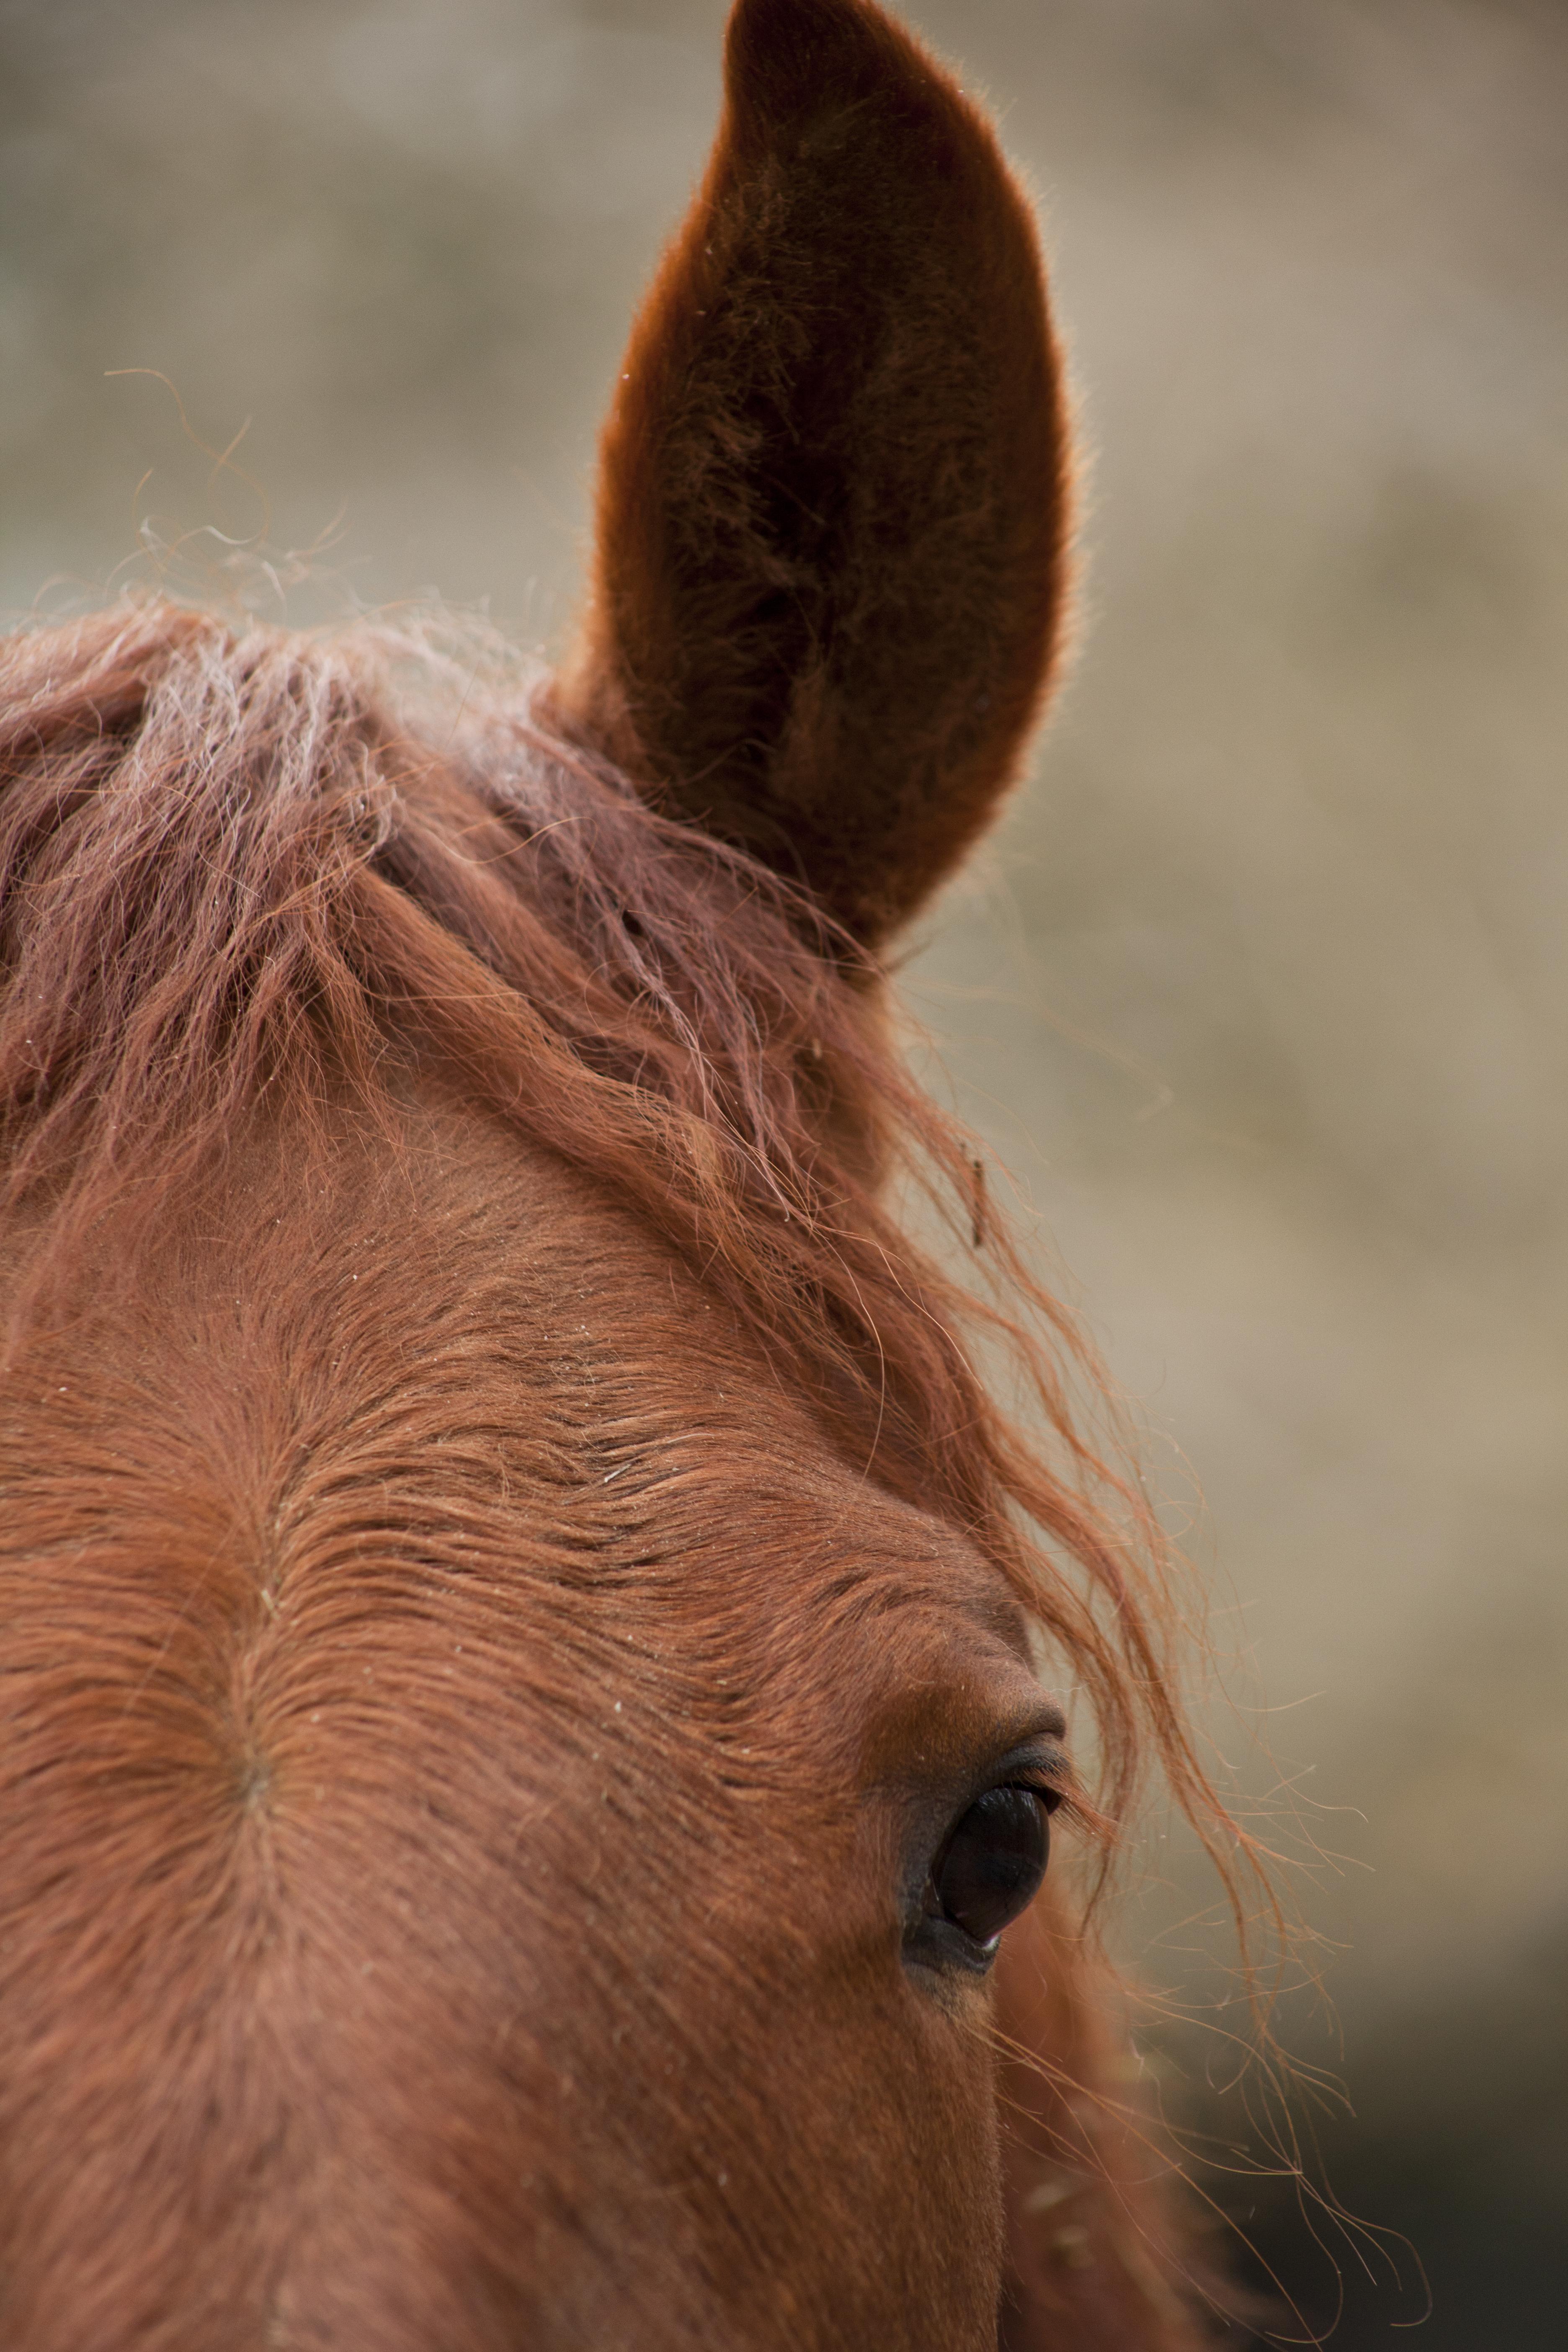 Horse #3